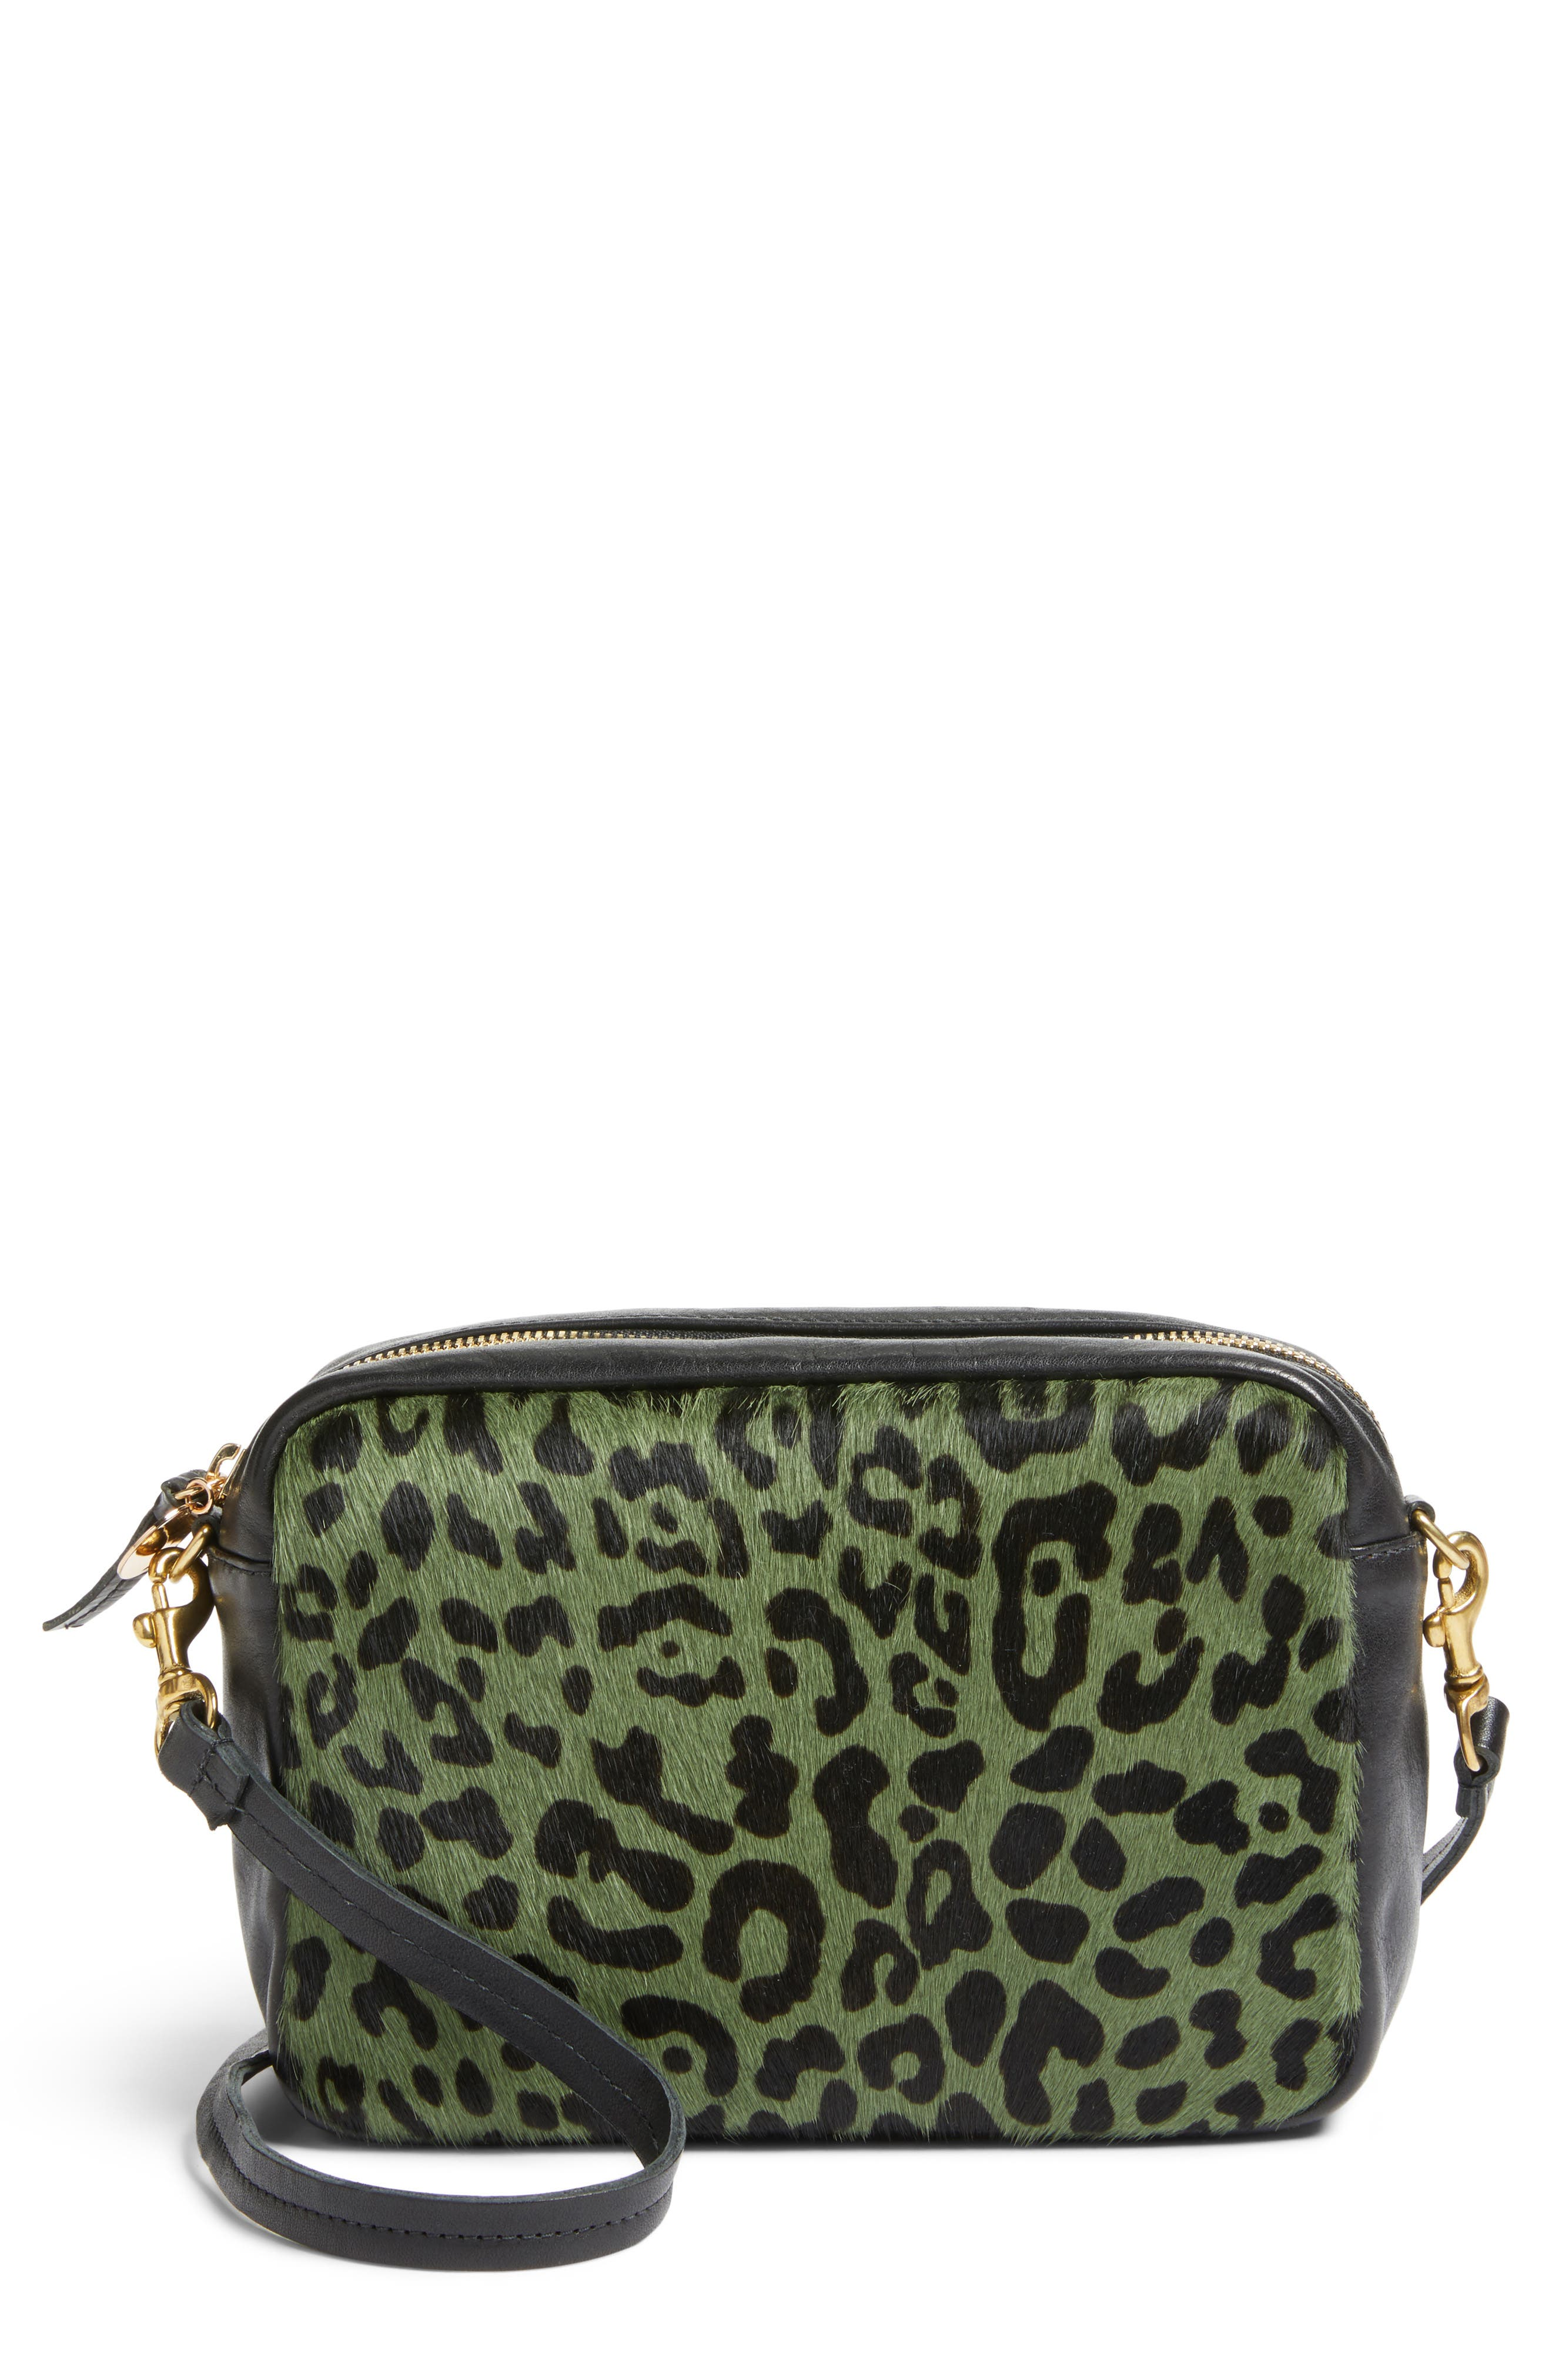 Midi Sac Leather & Genuine Calf Hair Shoulder Bag,                             Main thumbnail 1, color,                             Agave Leopard